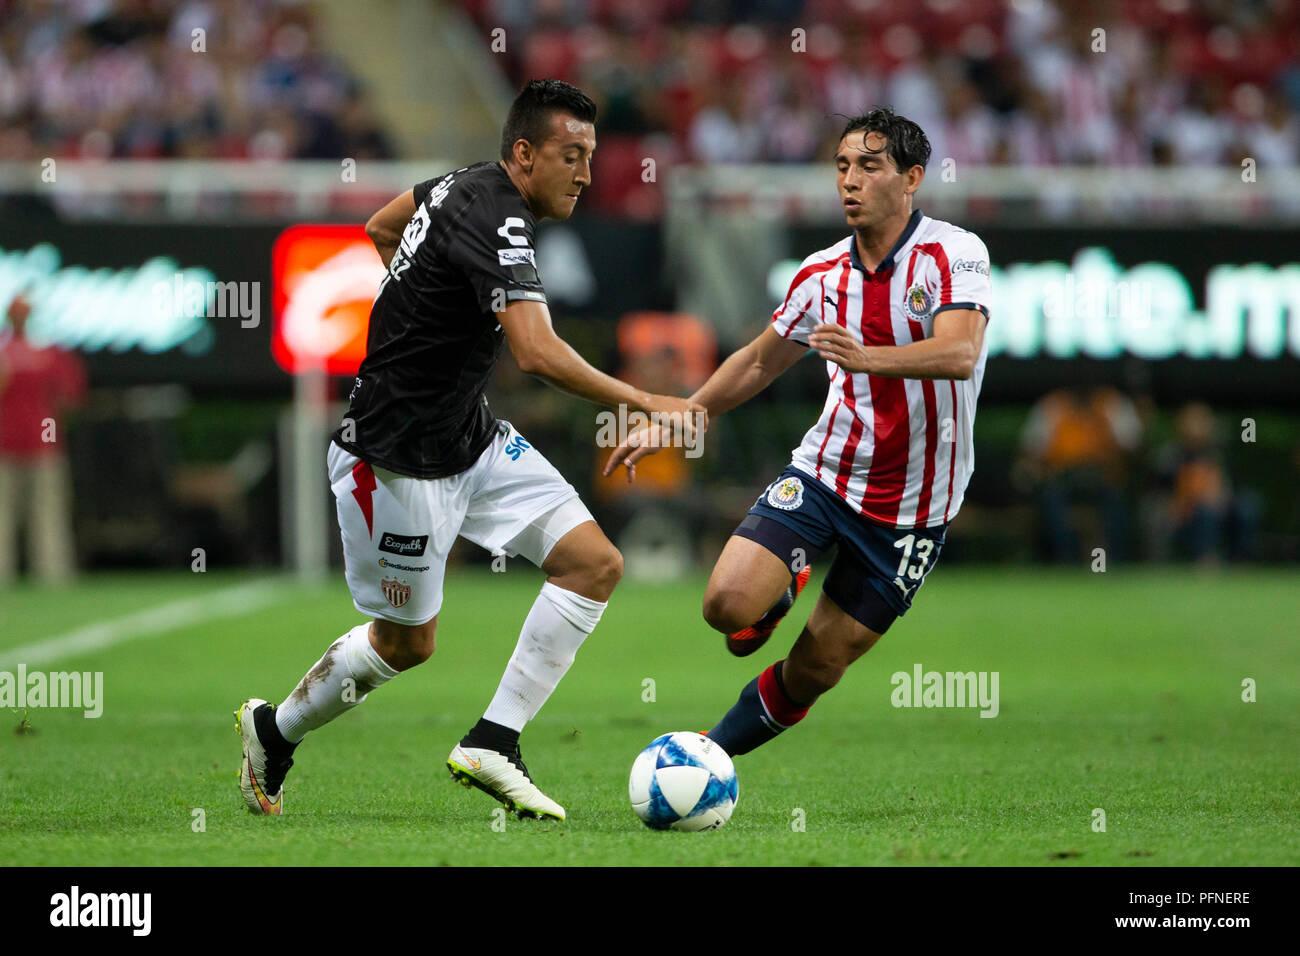 074b34b4f44 Gael Sandoval (R) of Chivas vies for the ball with Daniel Alvarez (L